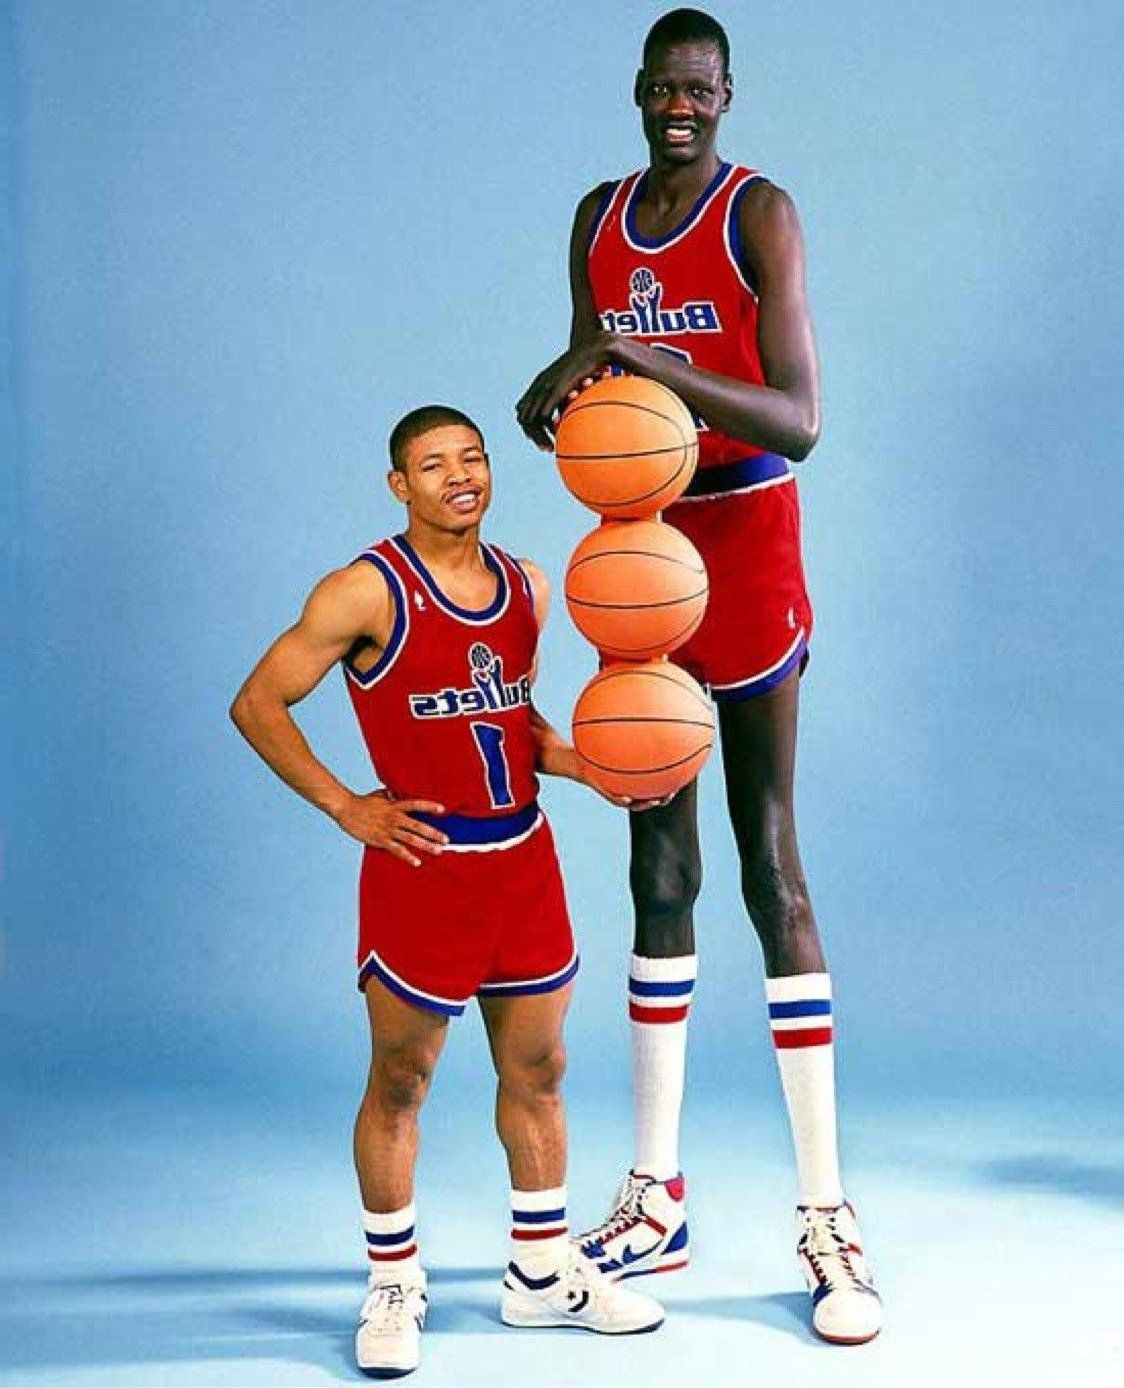 Short Vs Tall Manute Bol Basketball Players Nba Players